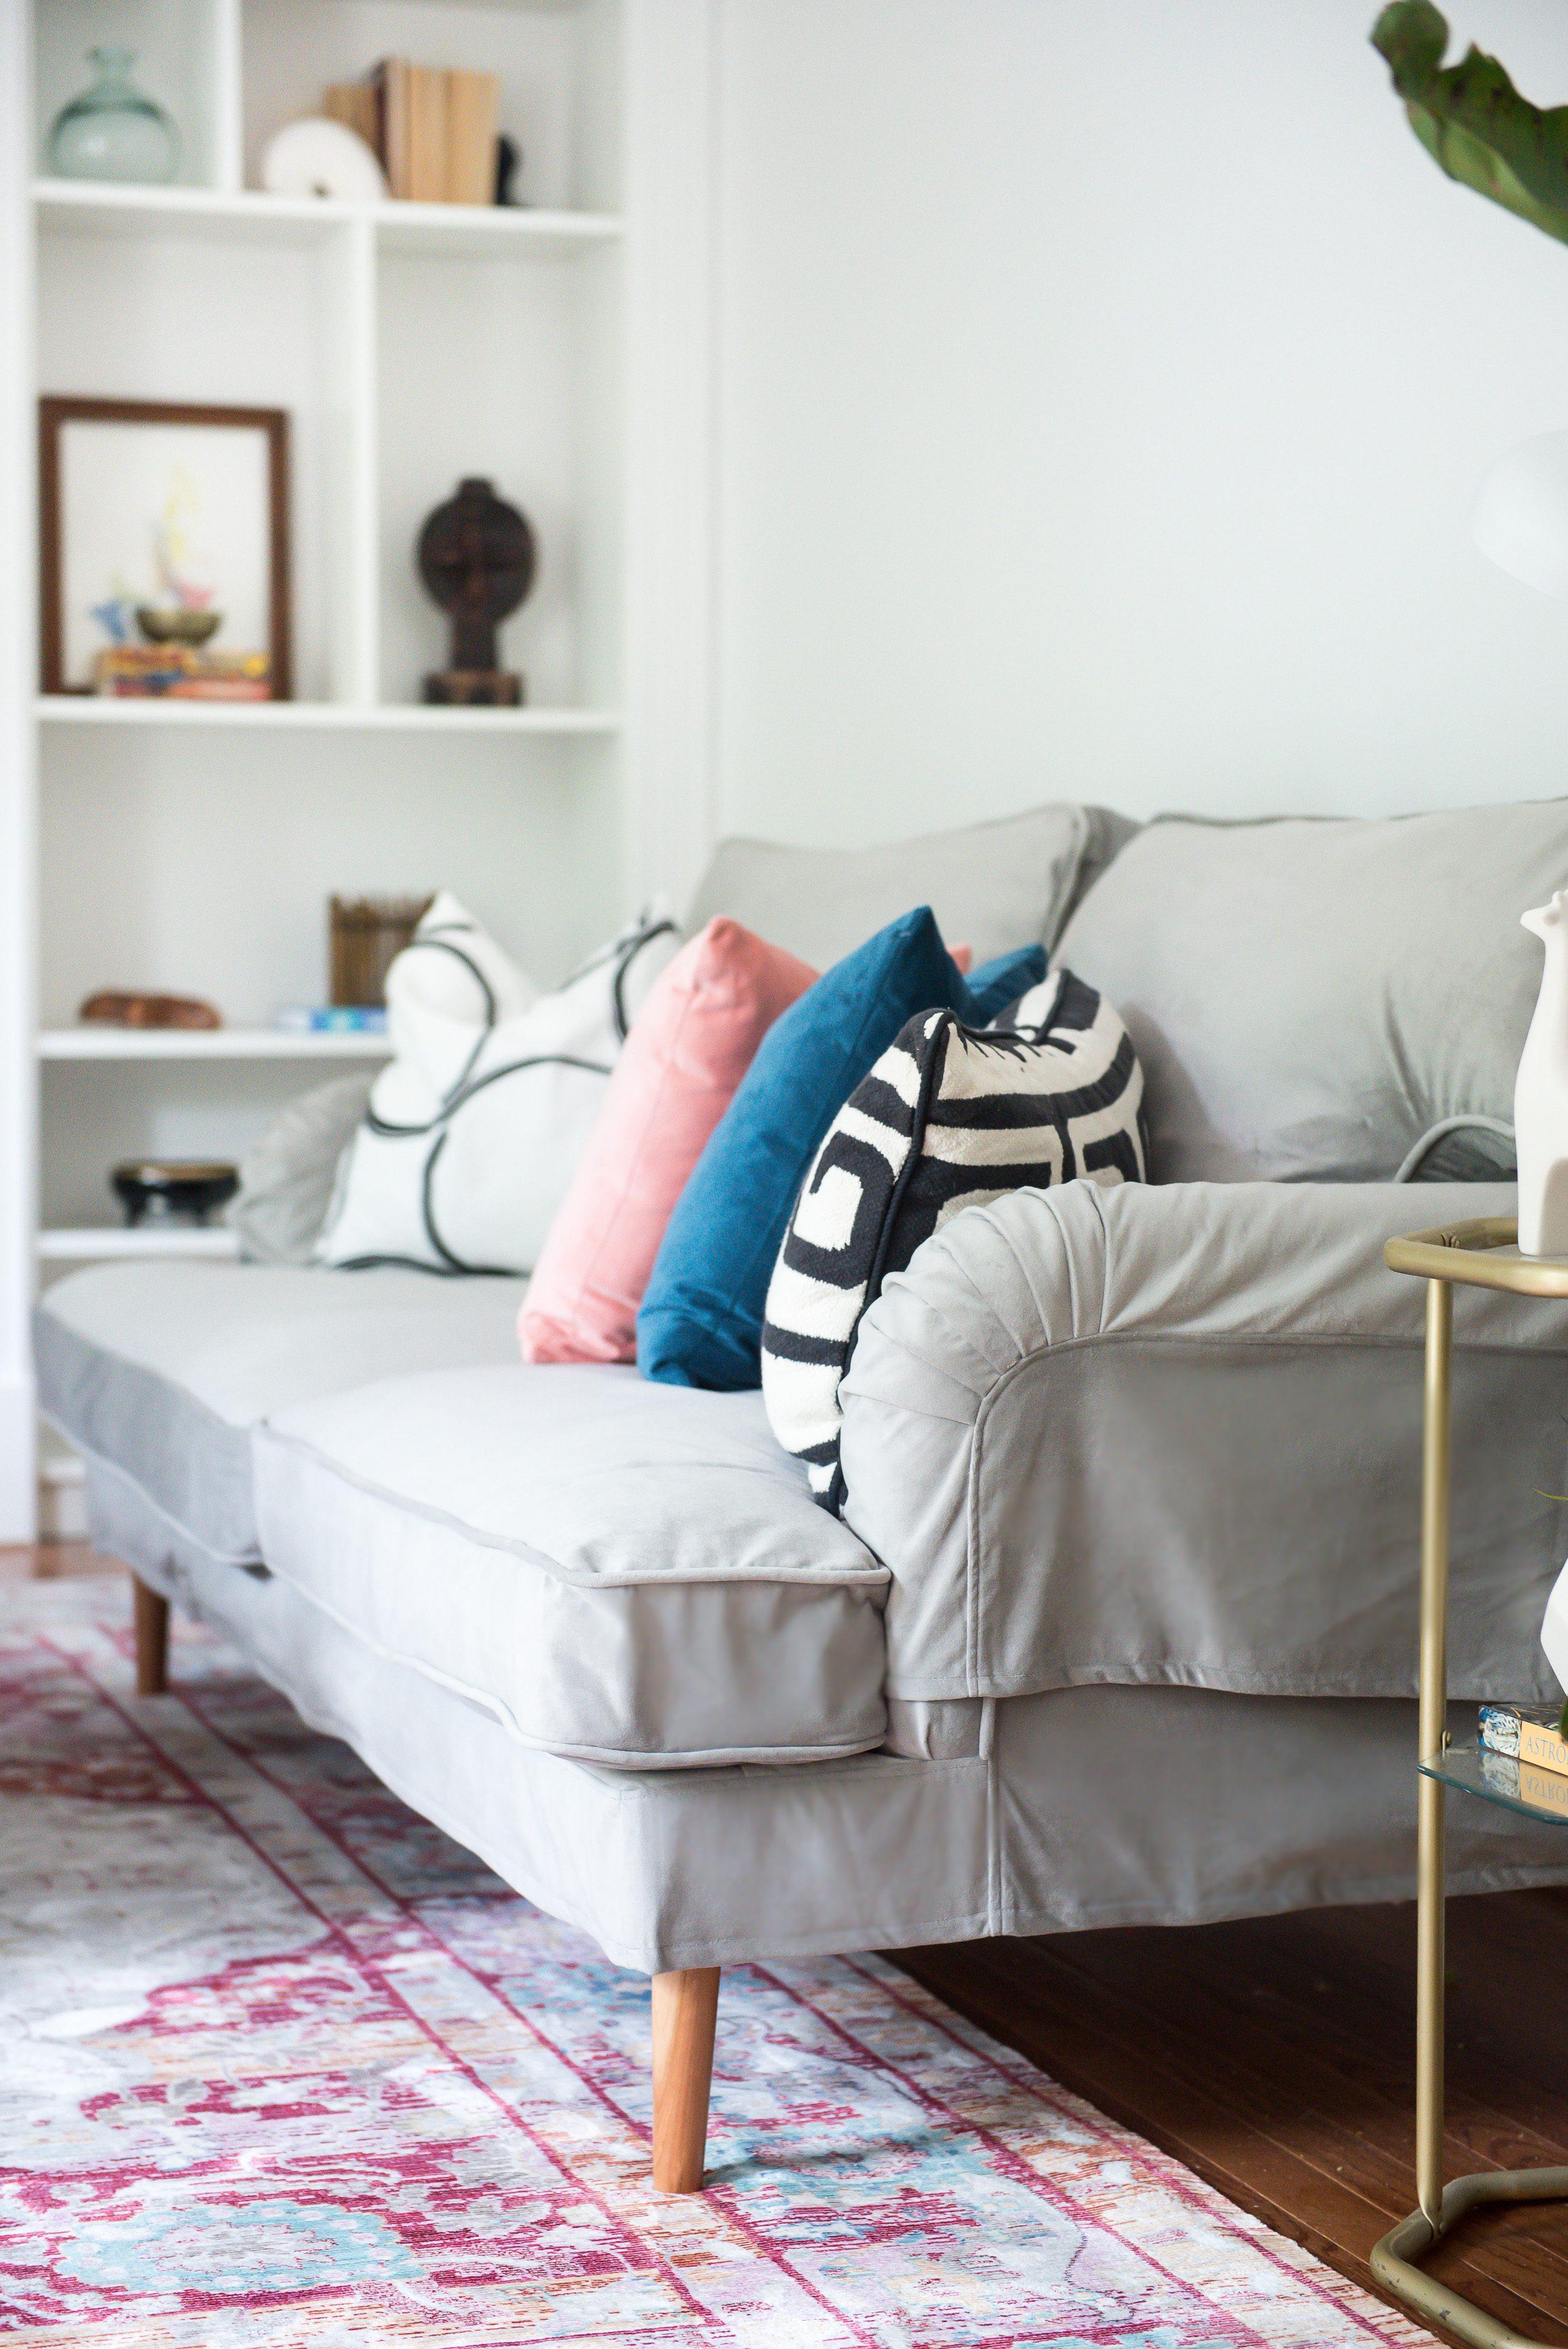 Terrific Ikea Stocksund Sofa Series 2014 Review New At Ikea Dailytribune Chair Design For Home Dailytribuneorg